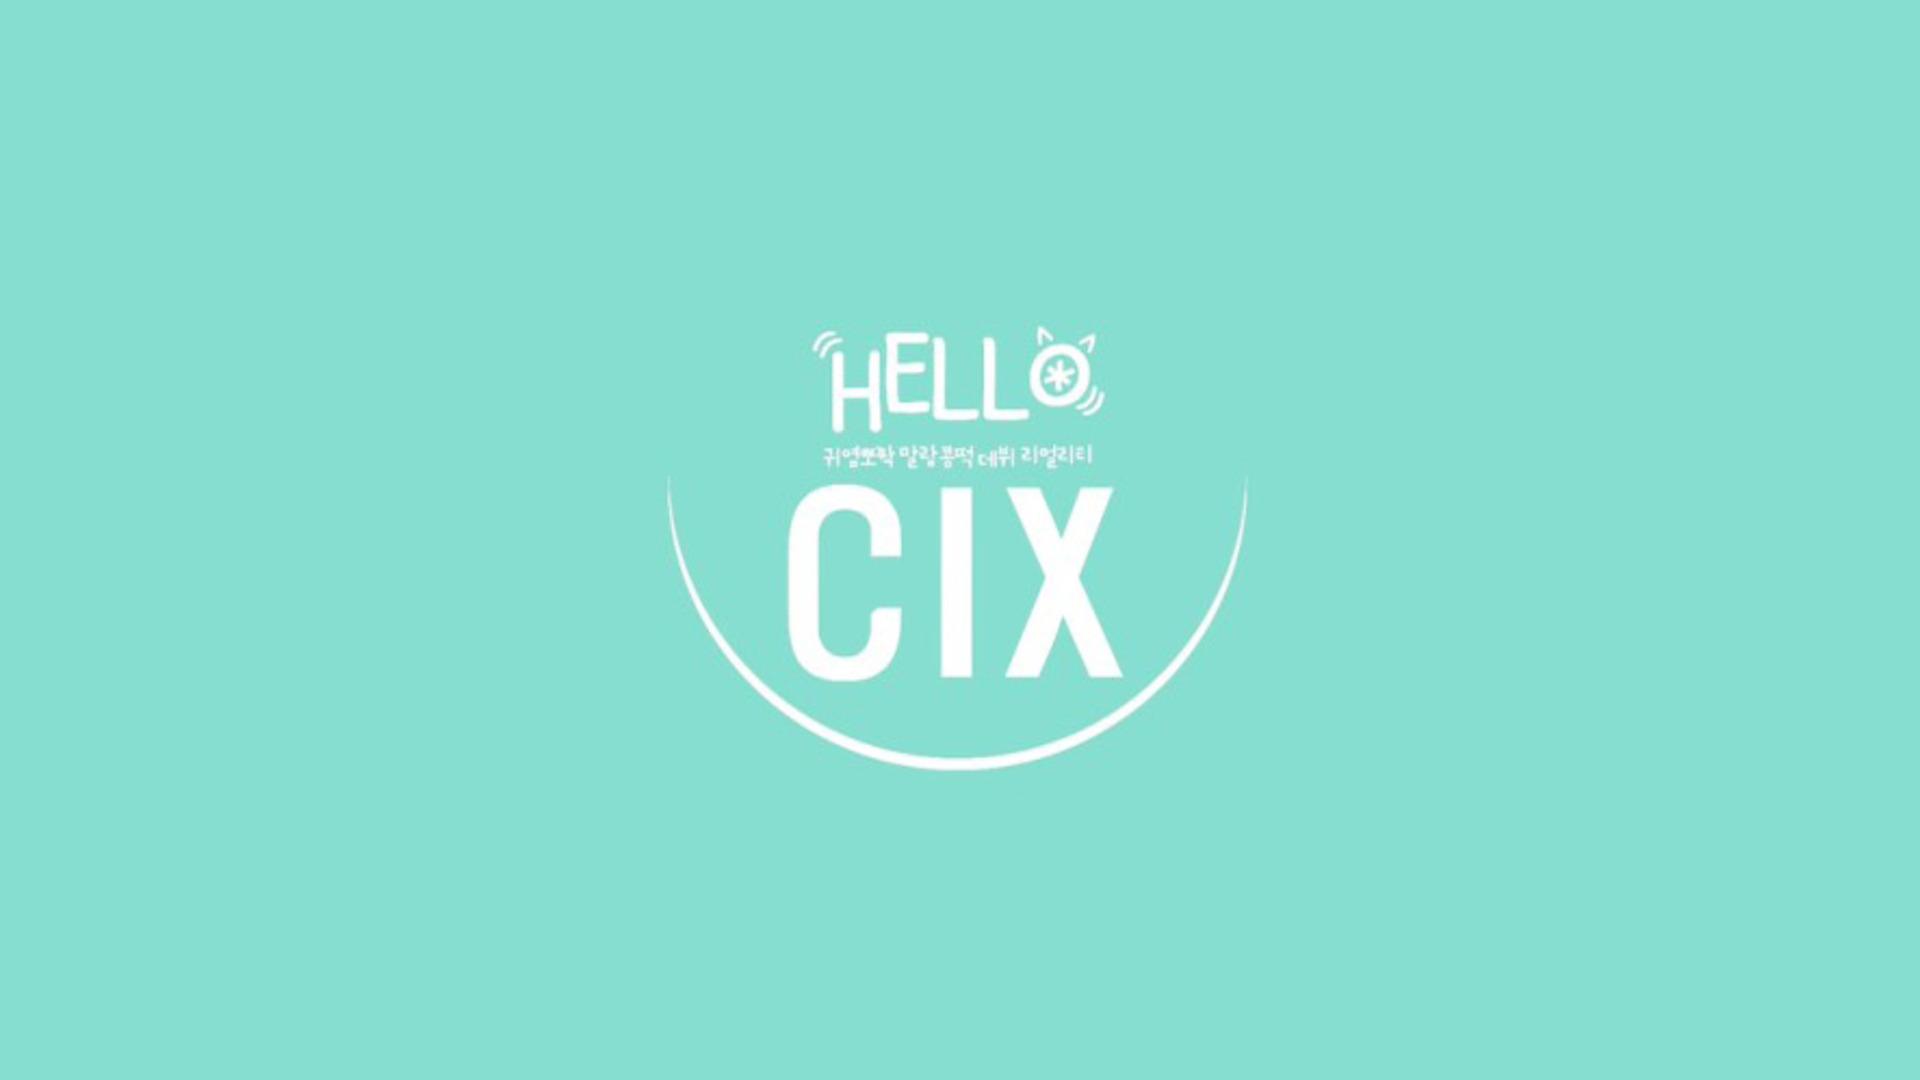 Show Hello CIX